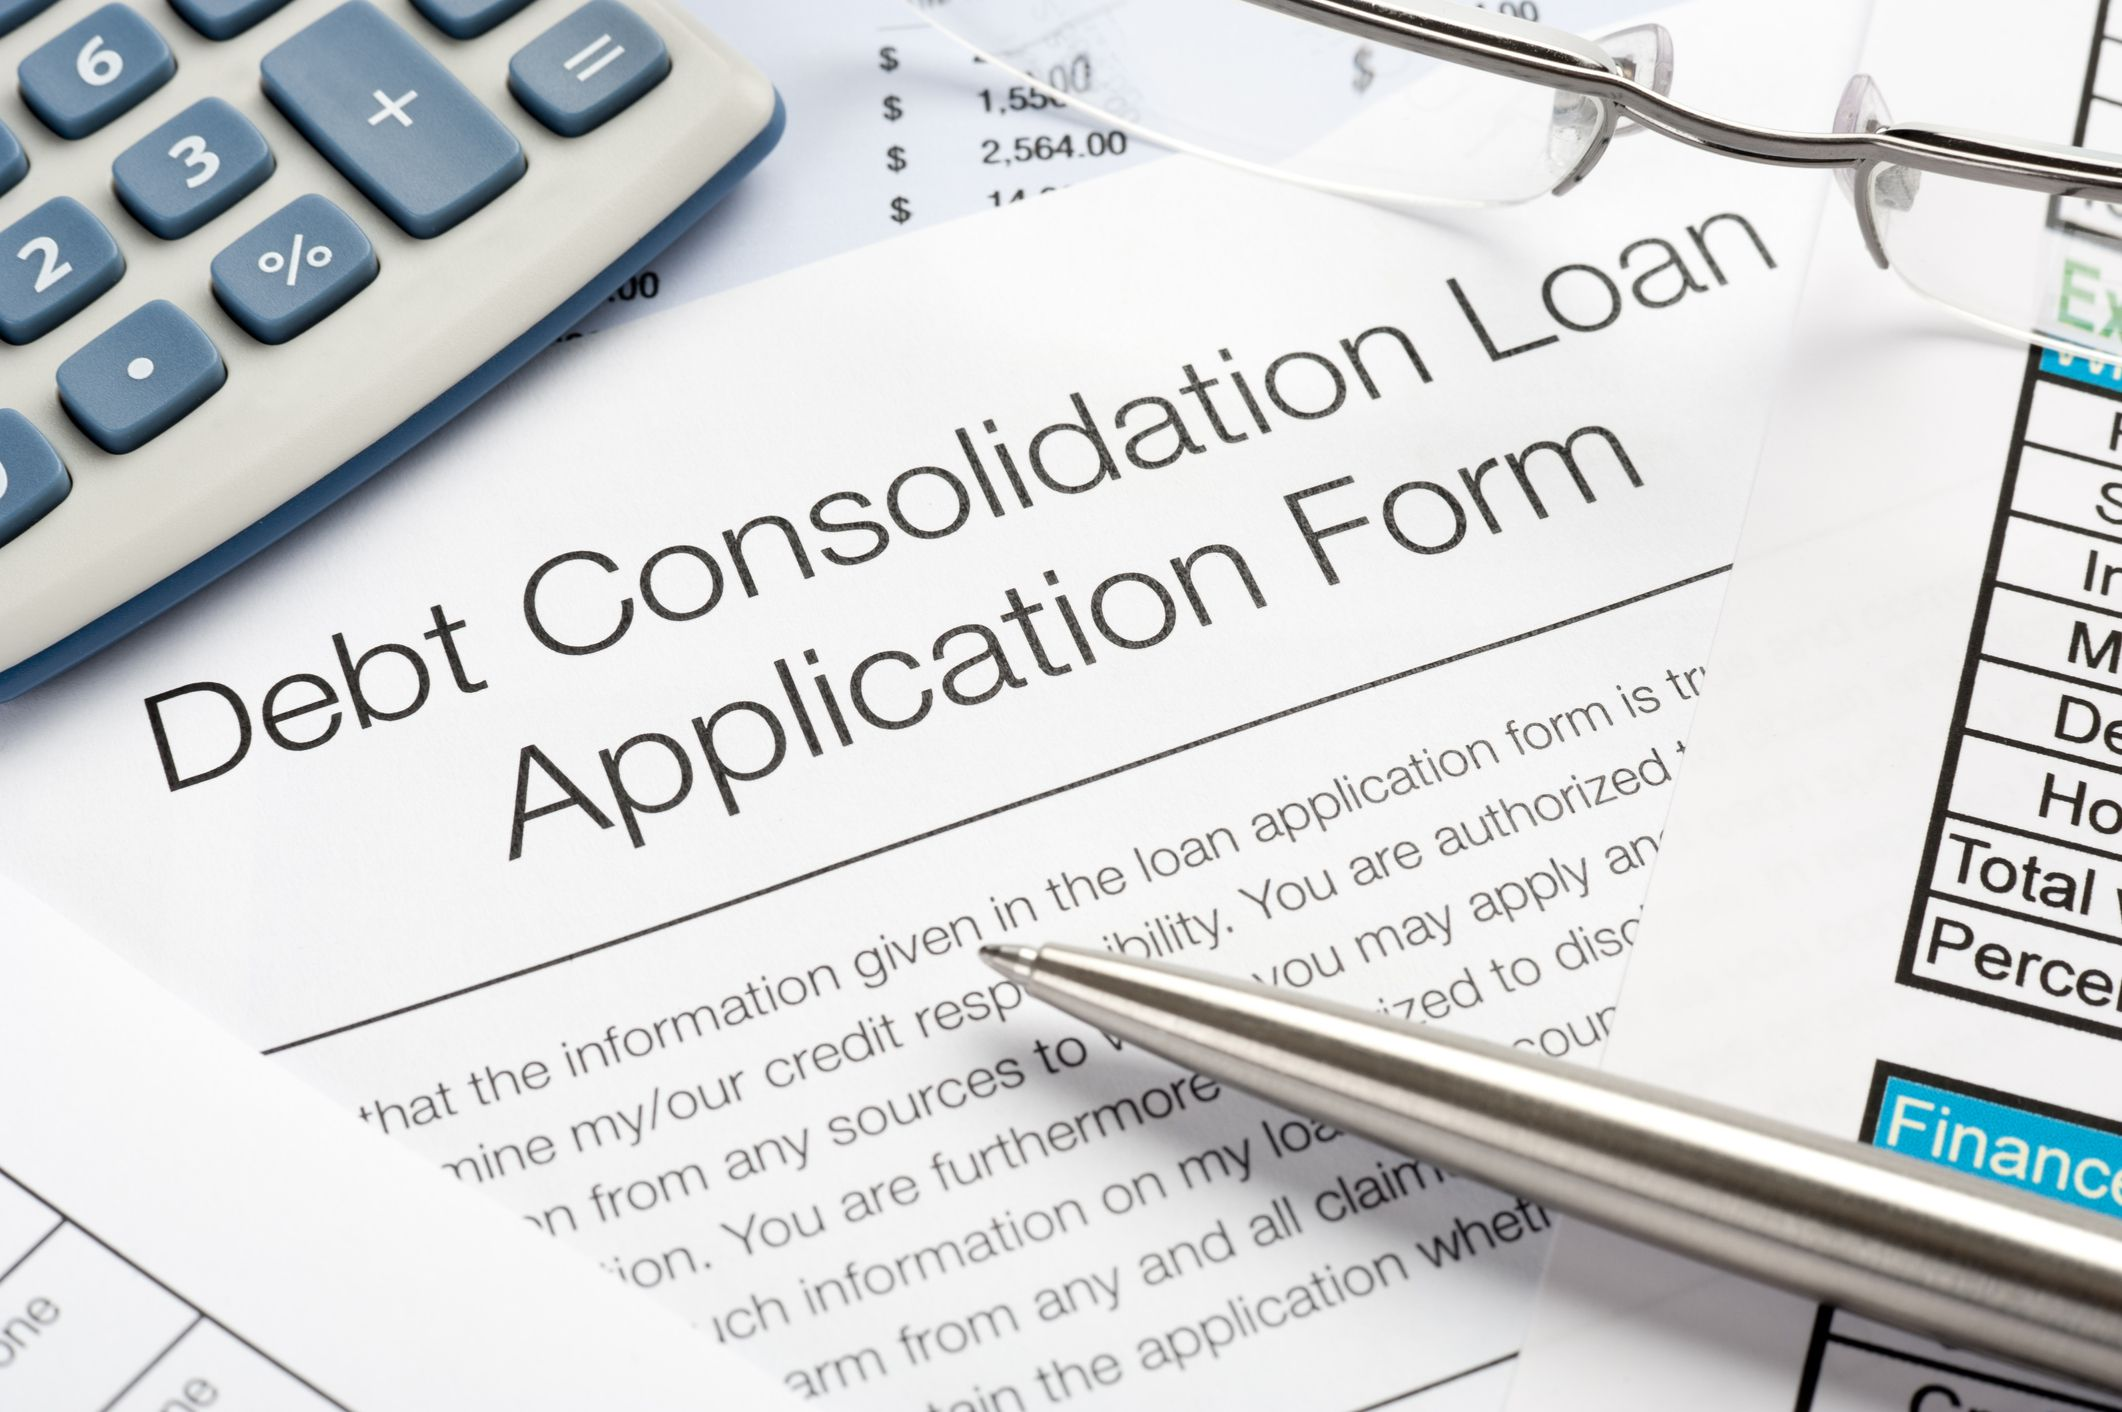 debt consolidation form